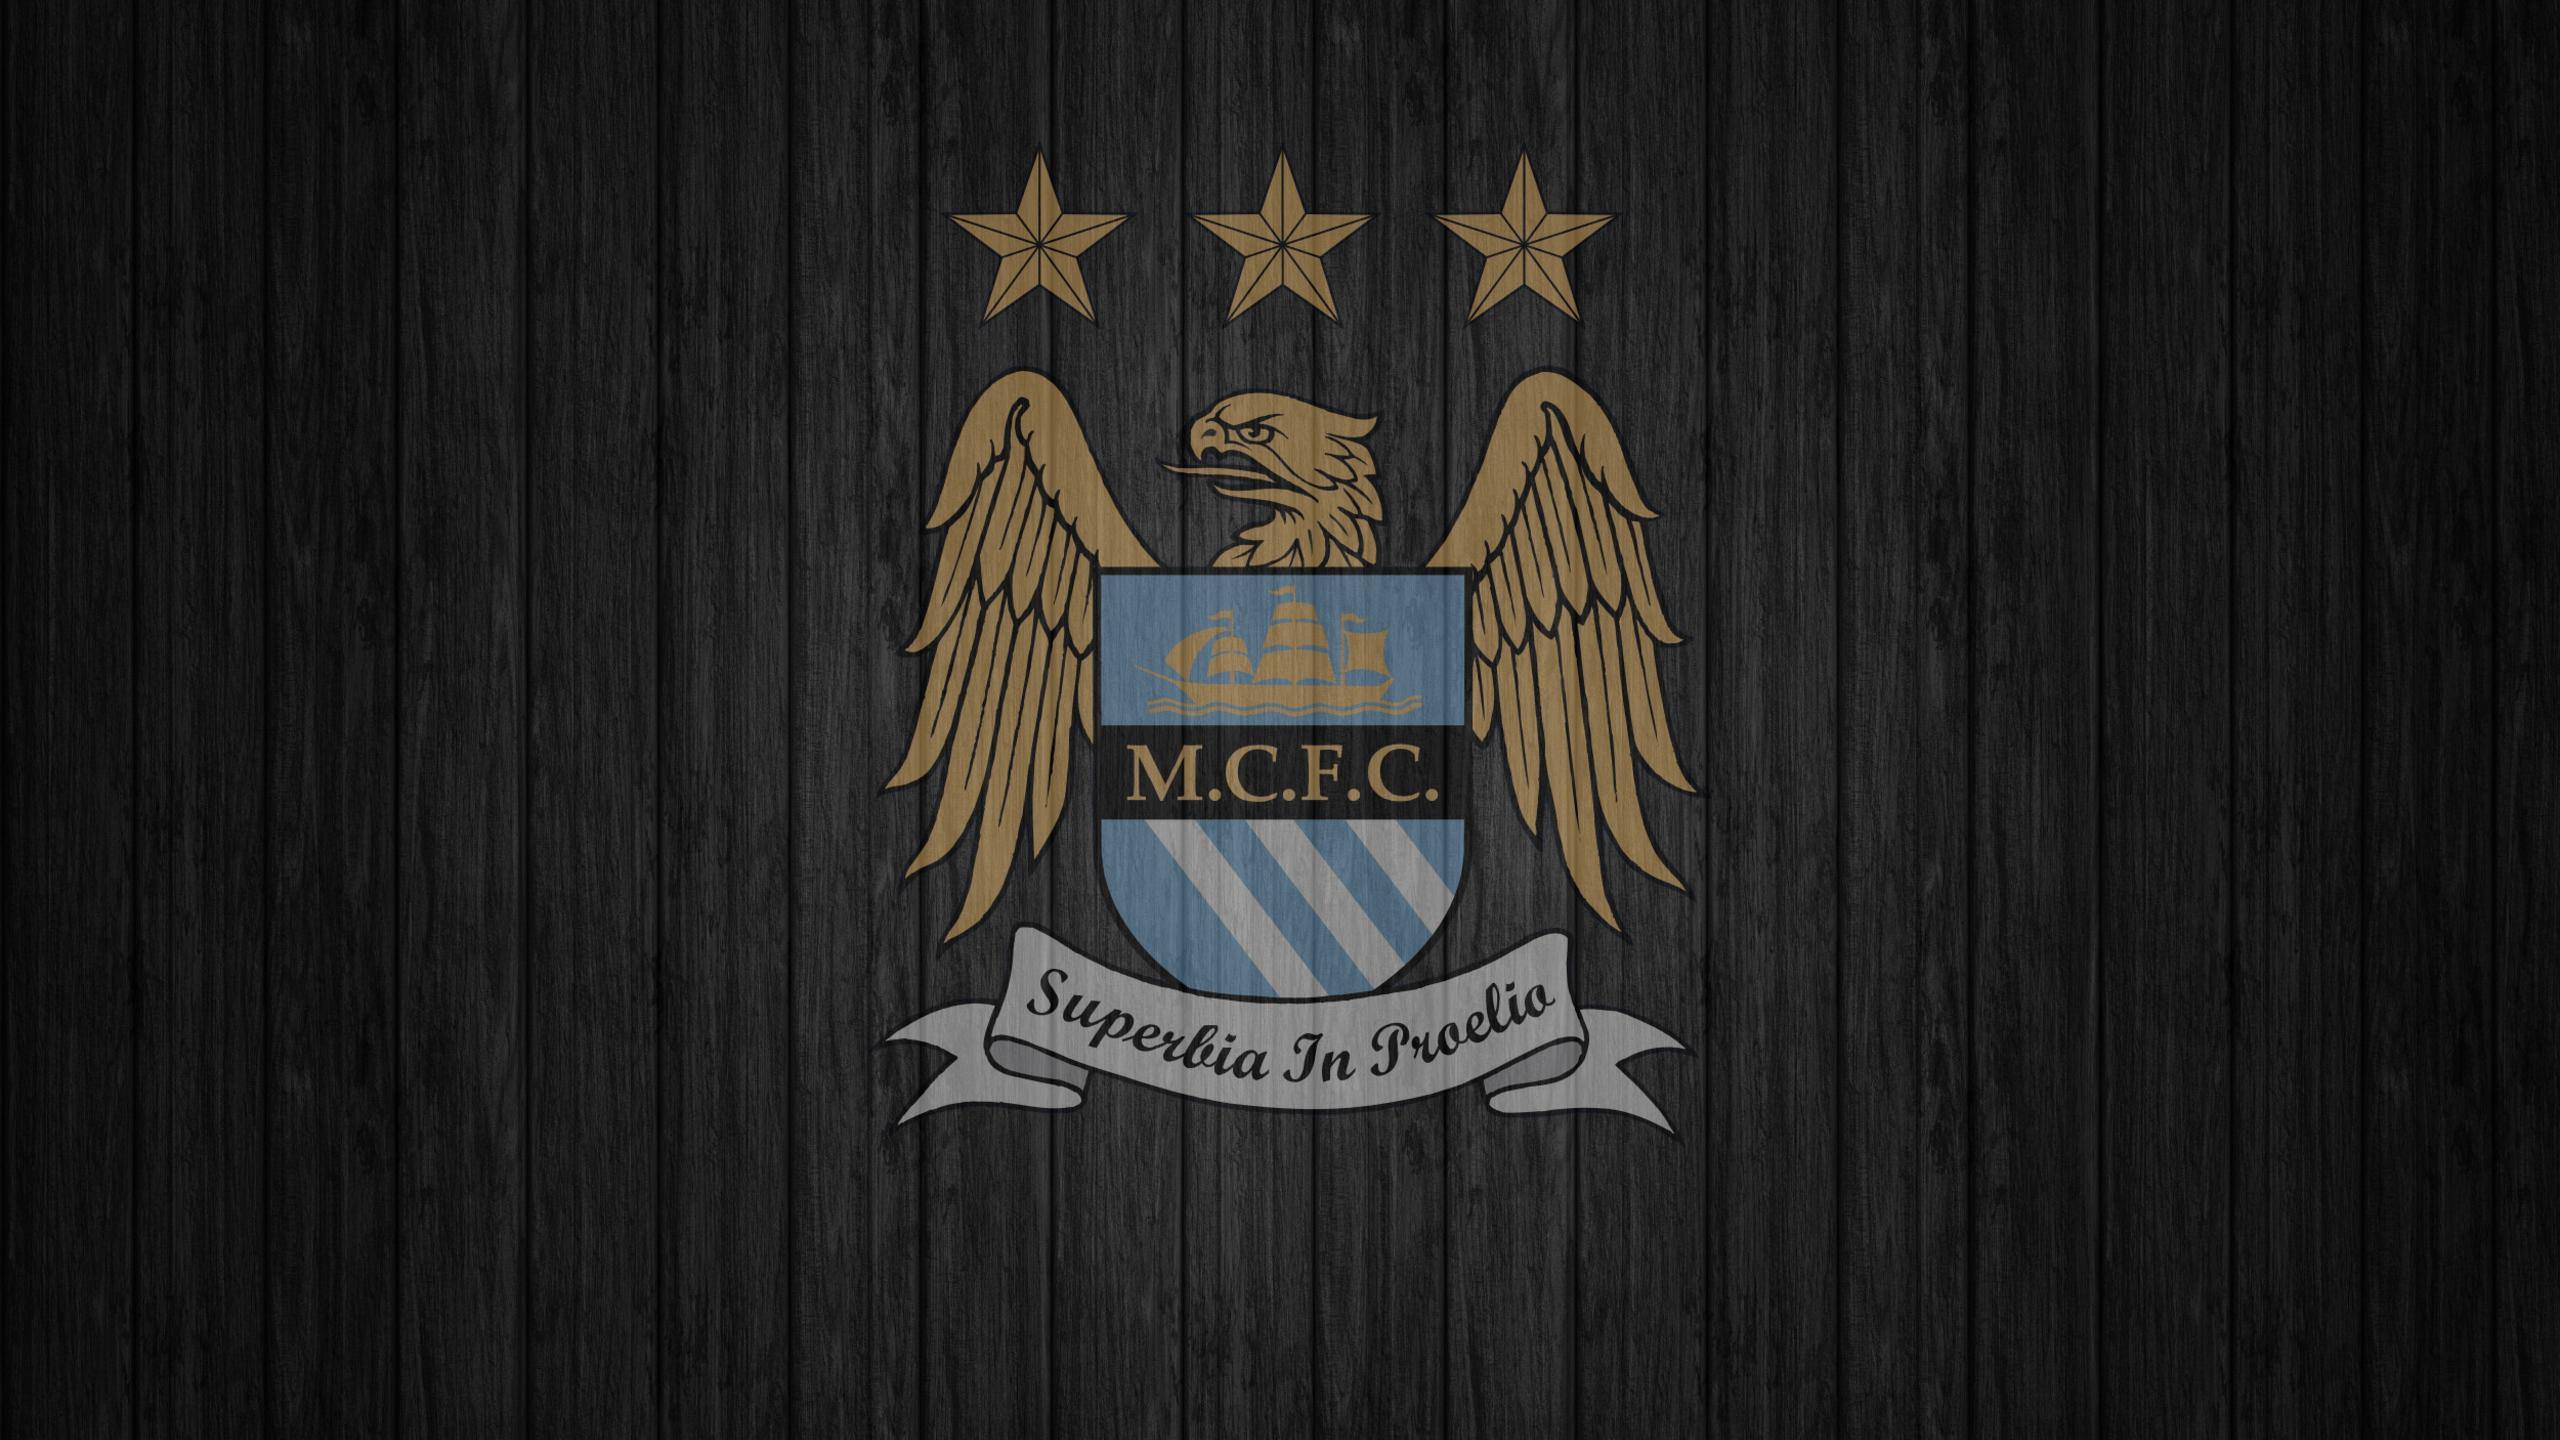 2560x1440 Manchester City Logo 1440p Resolution Hd 4k